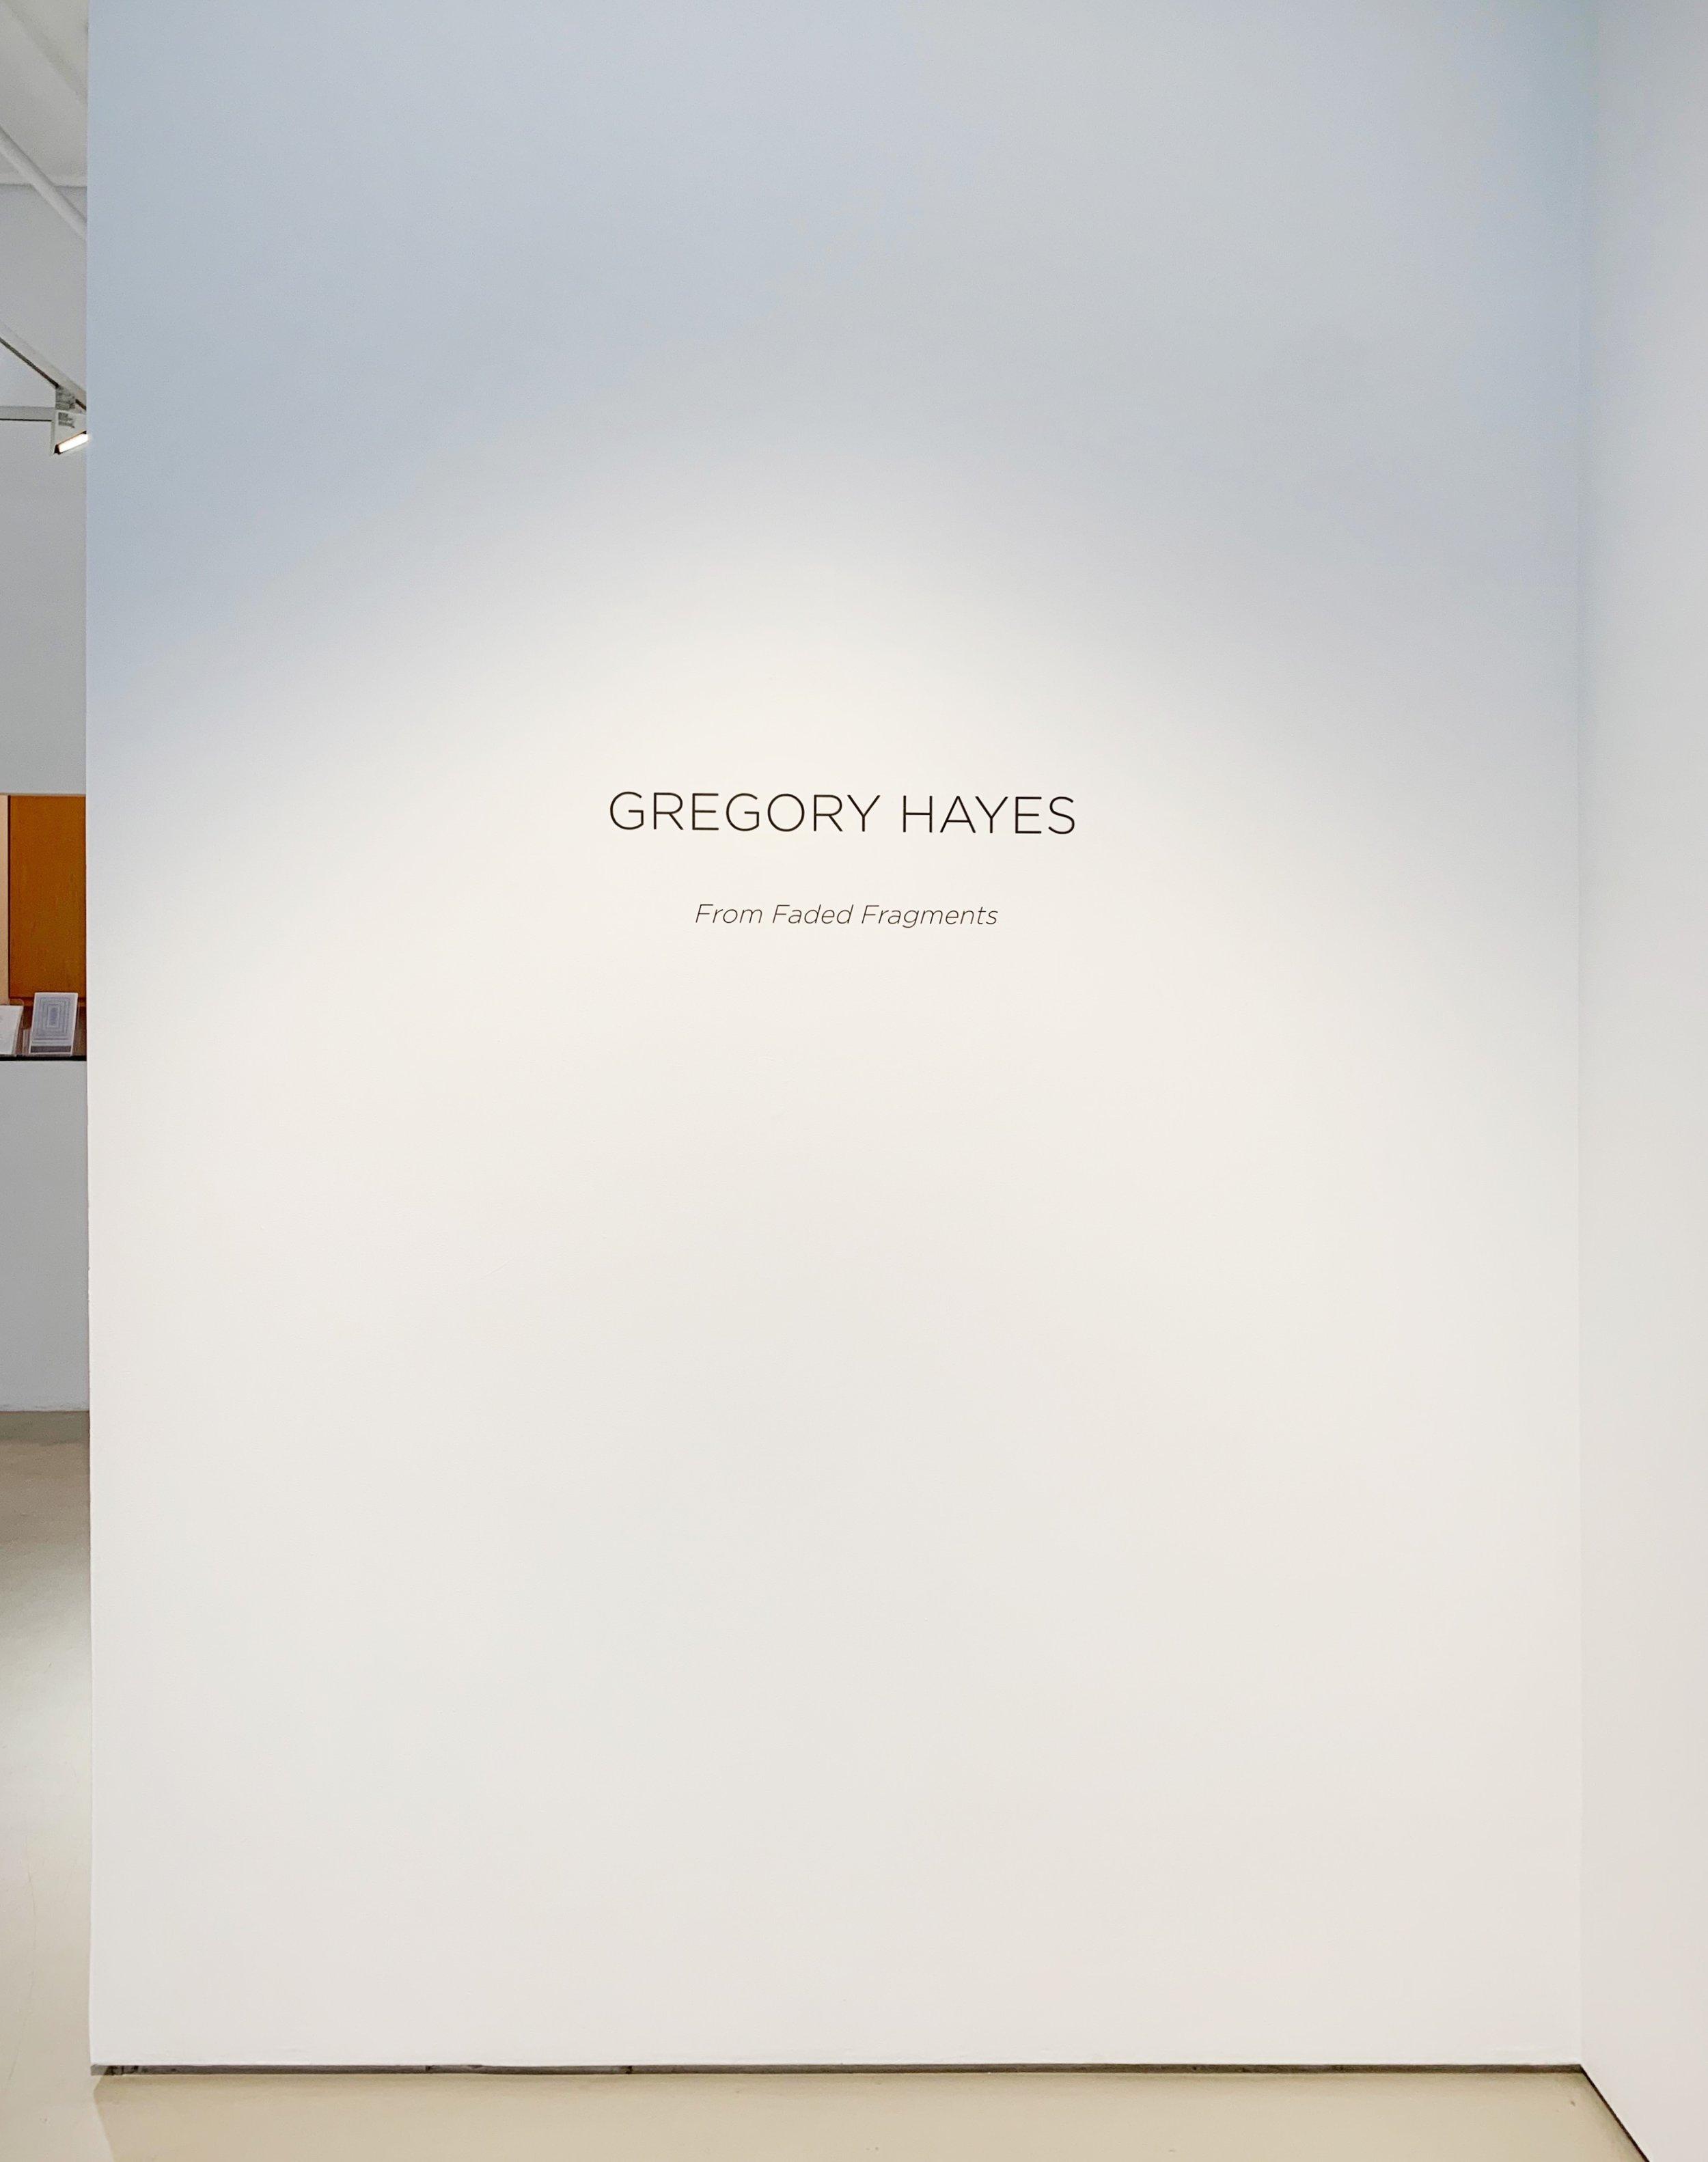 GregoryHayes_Install21.jpg